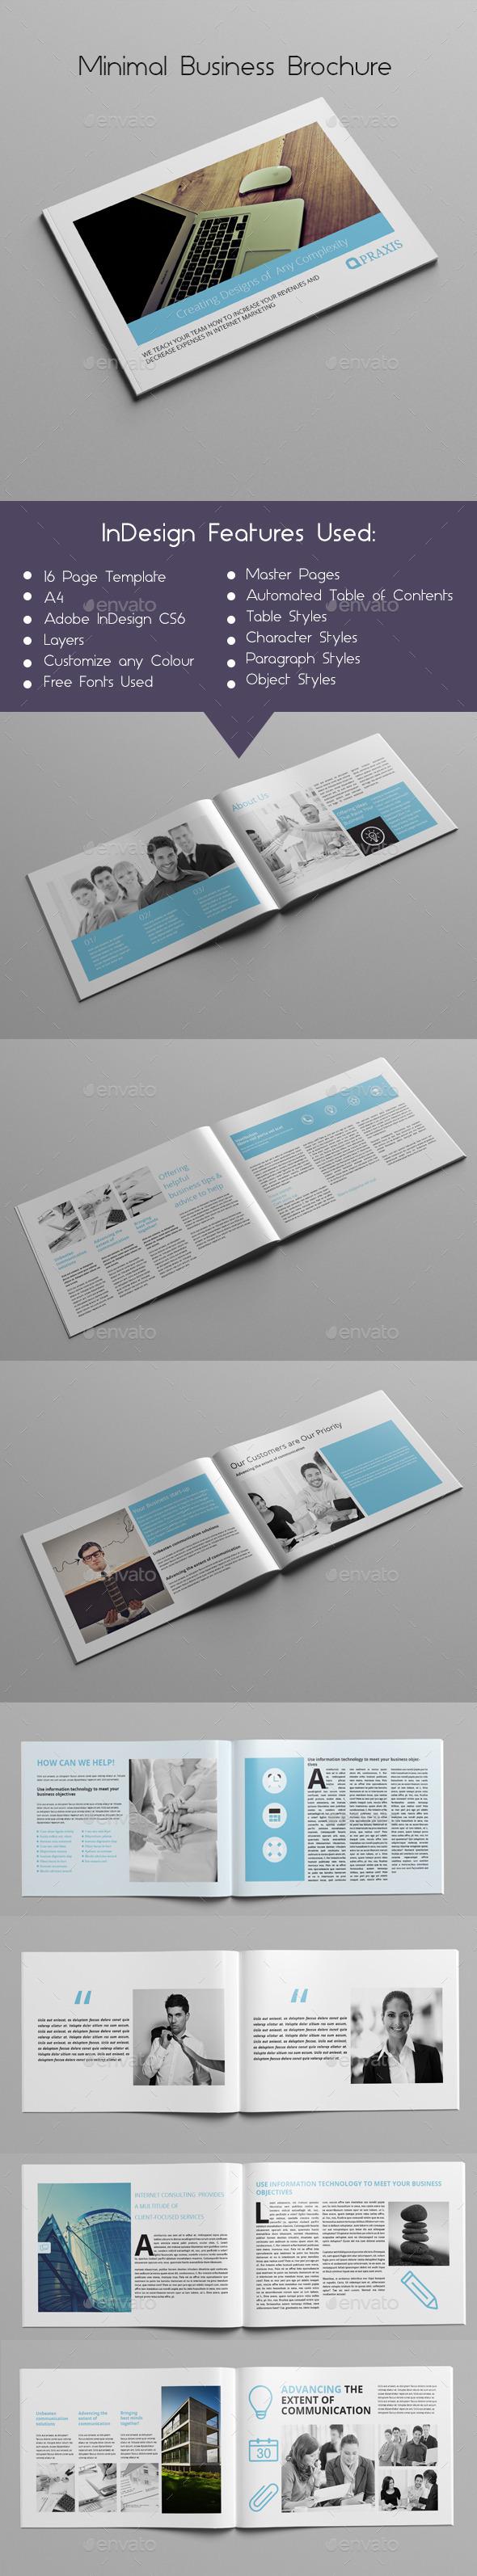 Minimal Business Brochure - Corporate Brochures